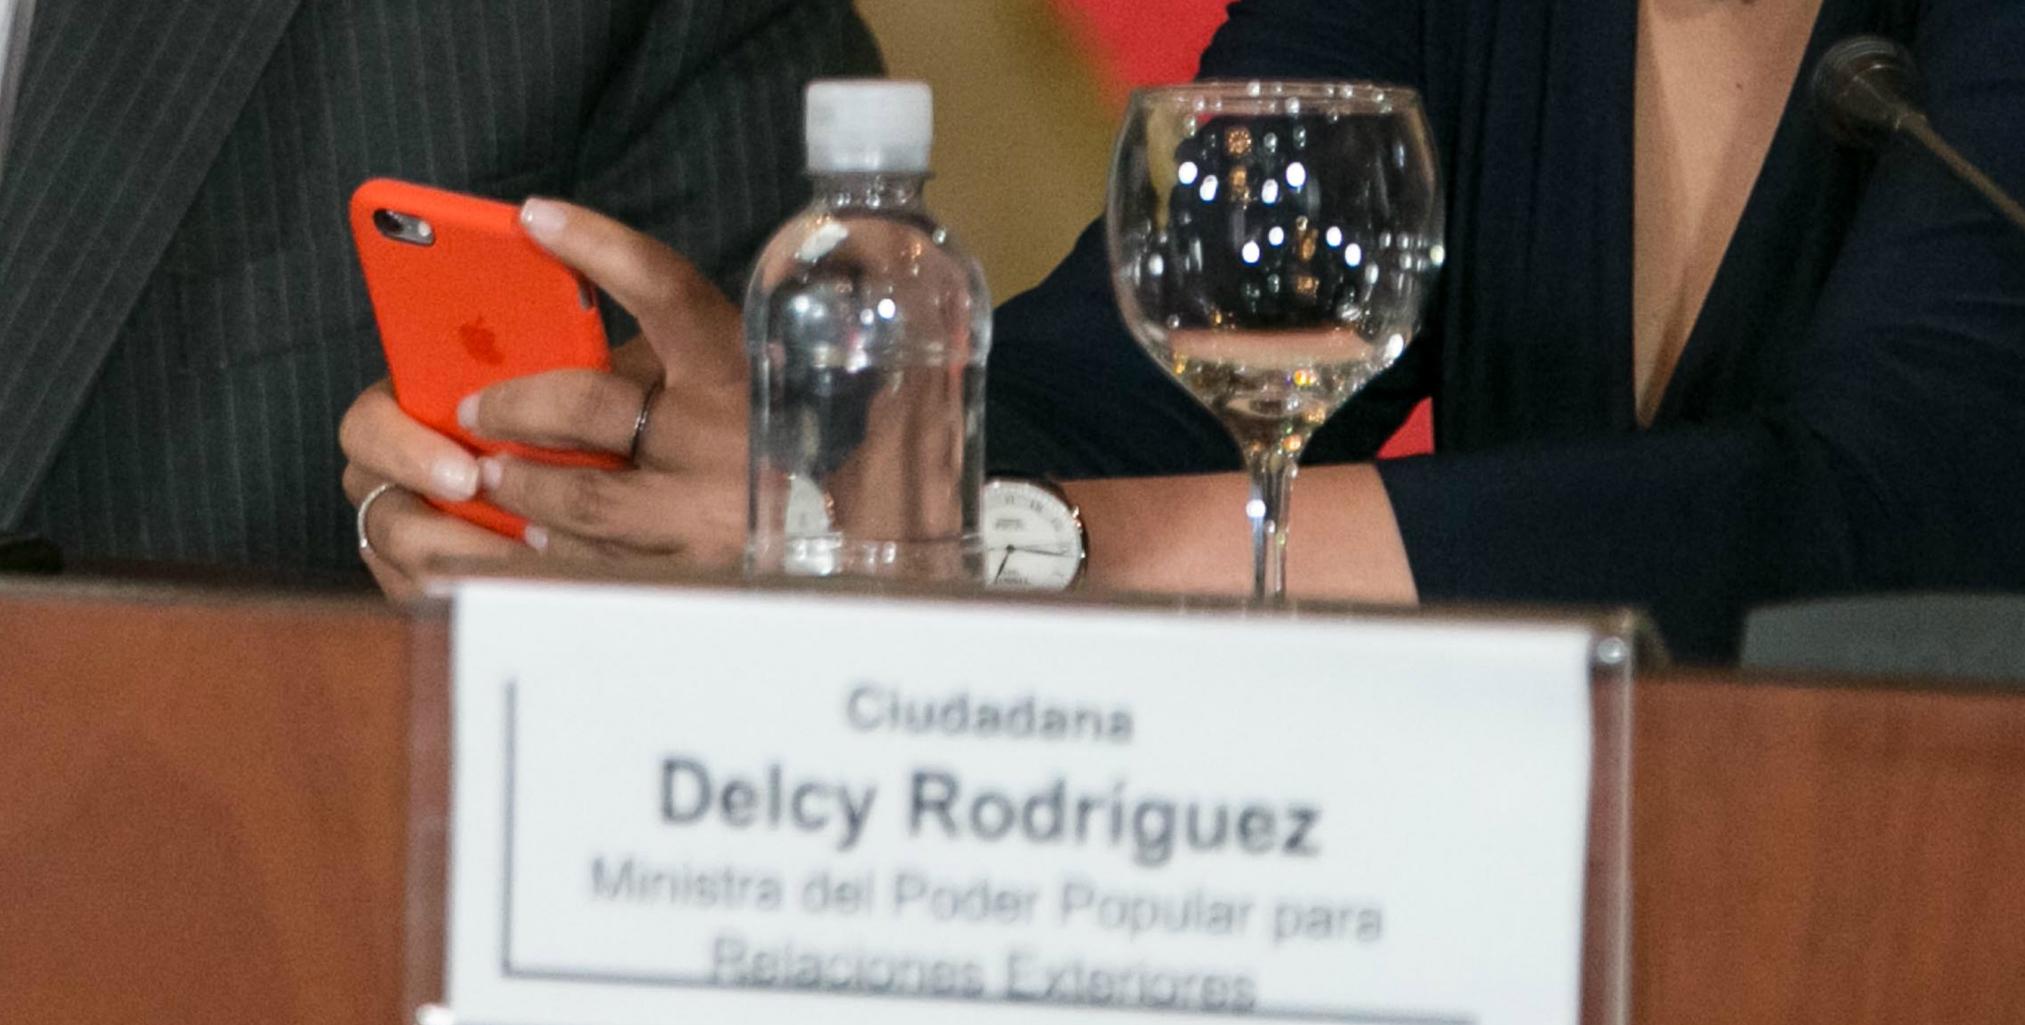 iphone delcy rodriguez